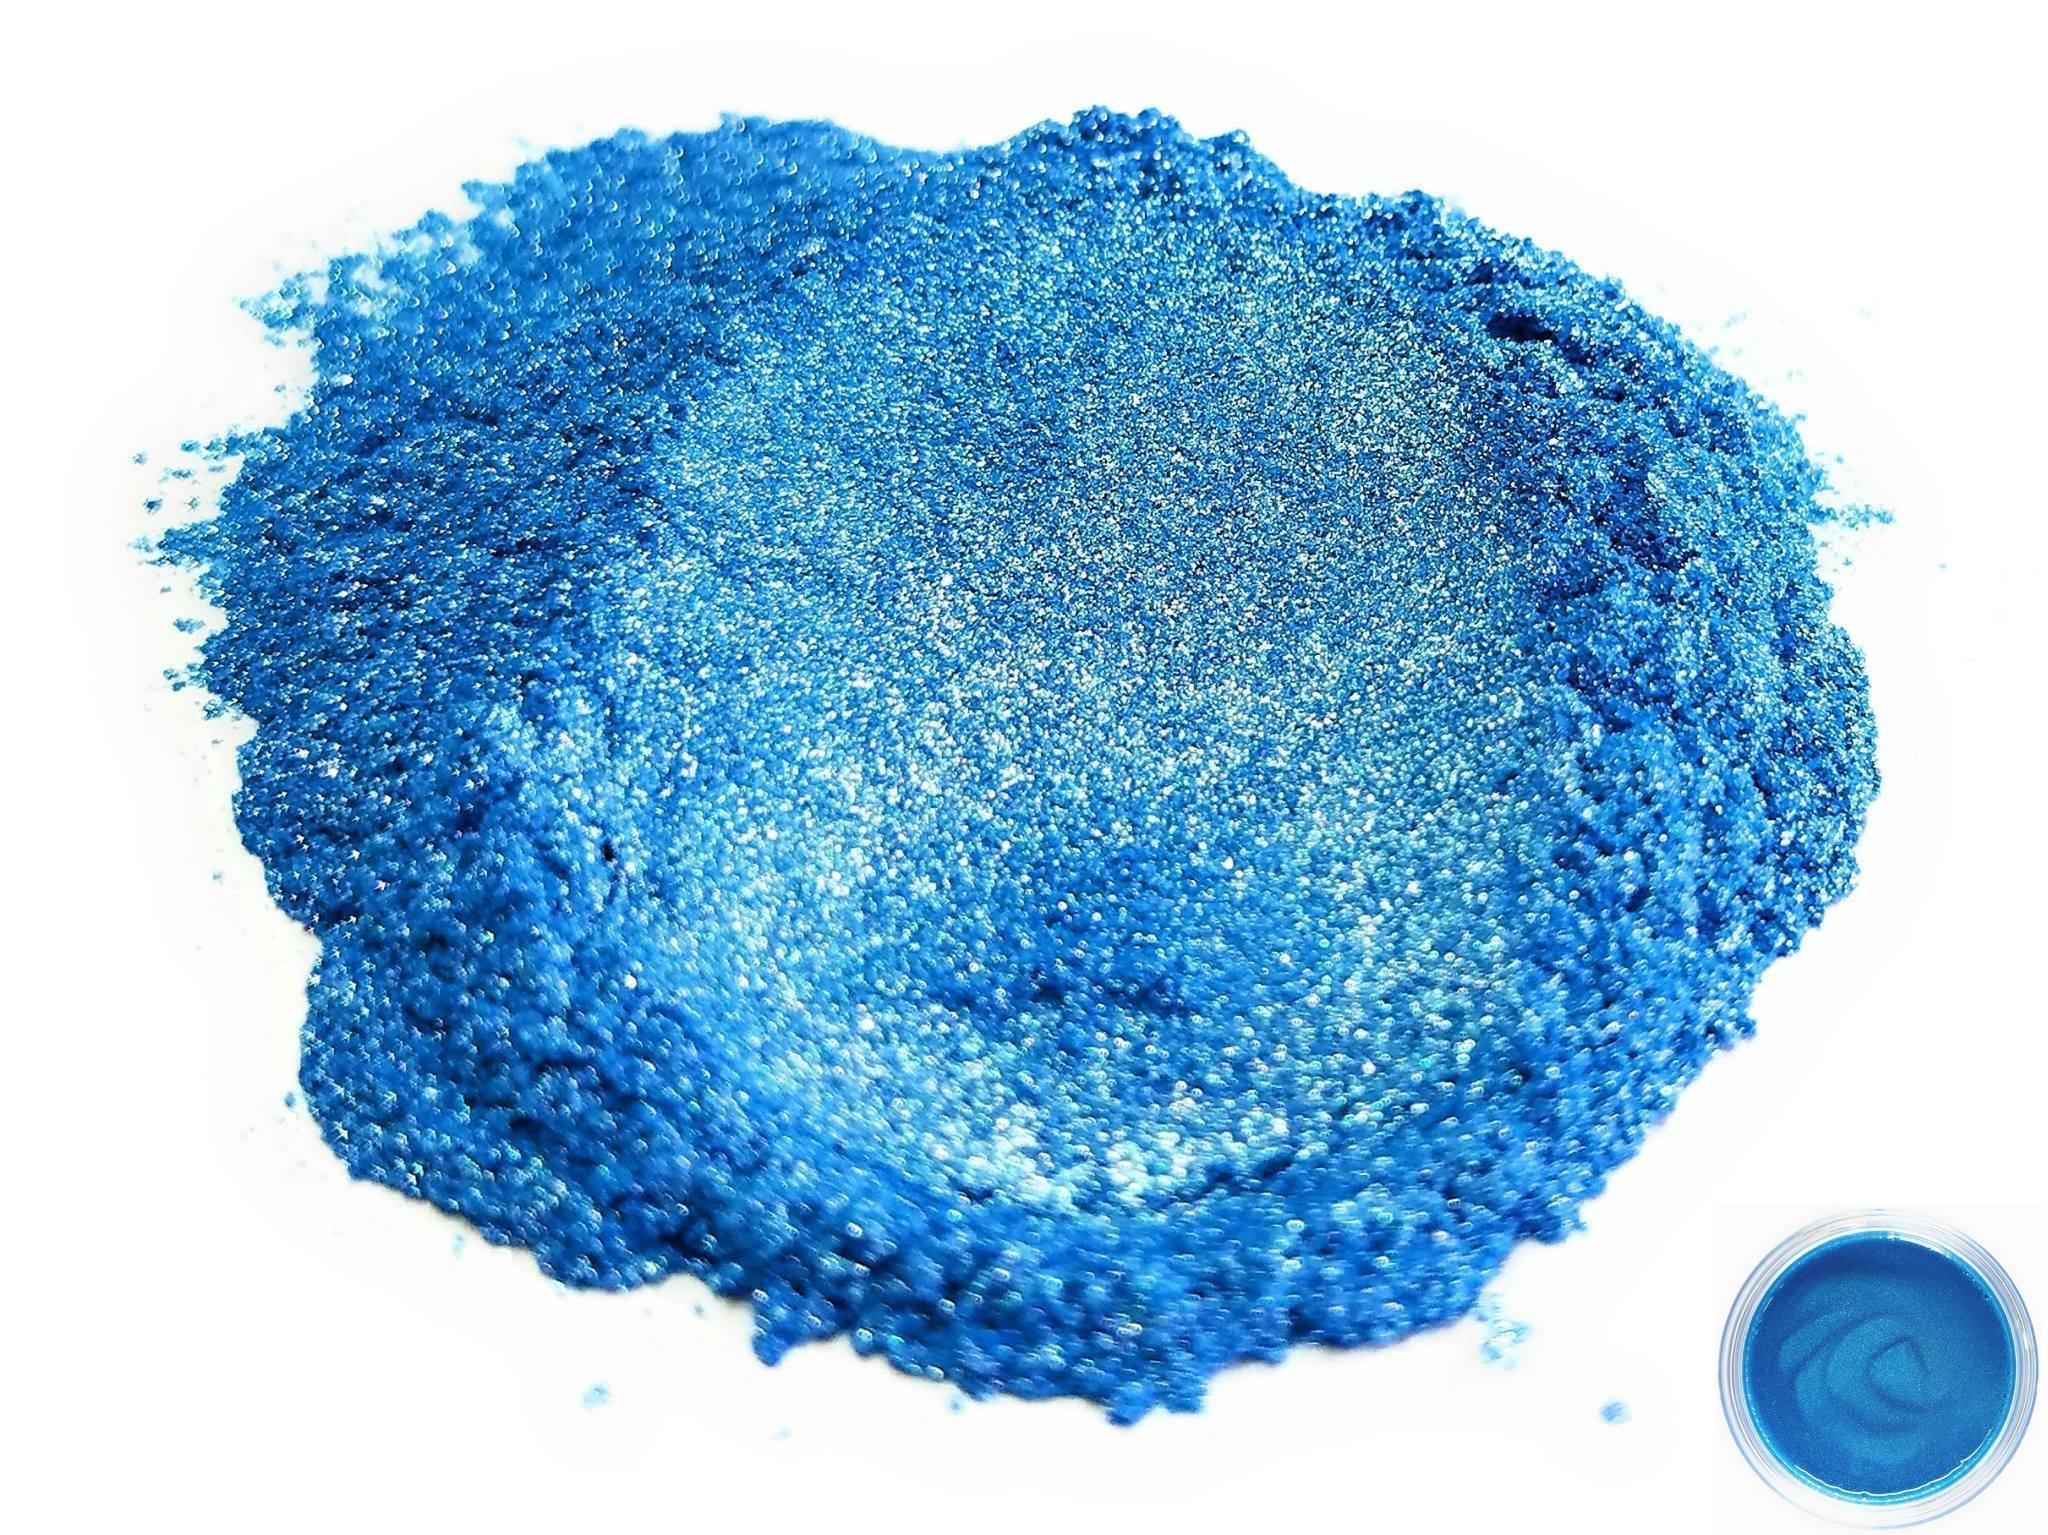 "Mica Powder Pigment ""Angel Blue"" (50g) Multipurpose DIY Arts and Crafts Additive | Natural Bath Bombs, Resin, Paint, Epoxy, Soap, Nail Polish, Lip Balm"